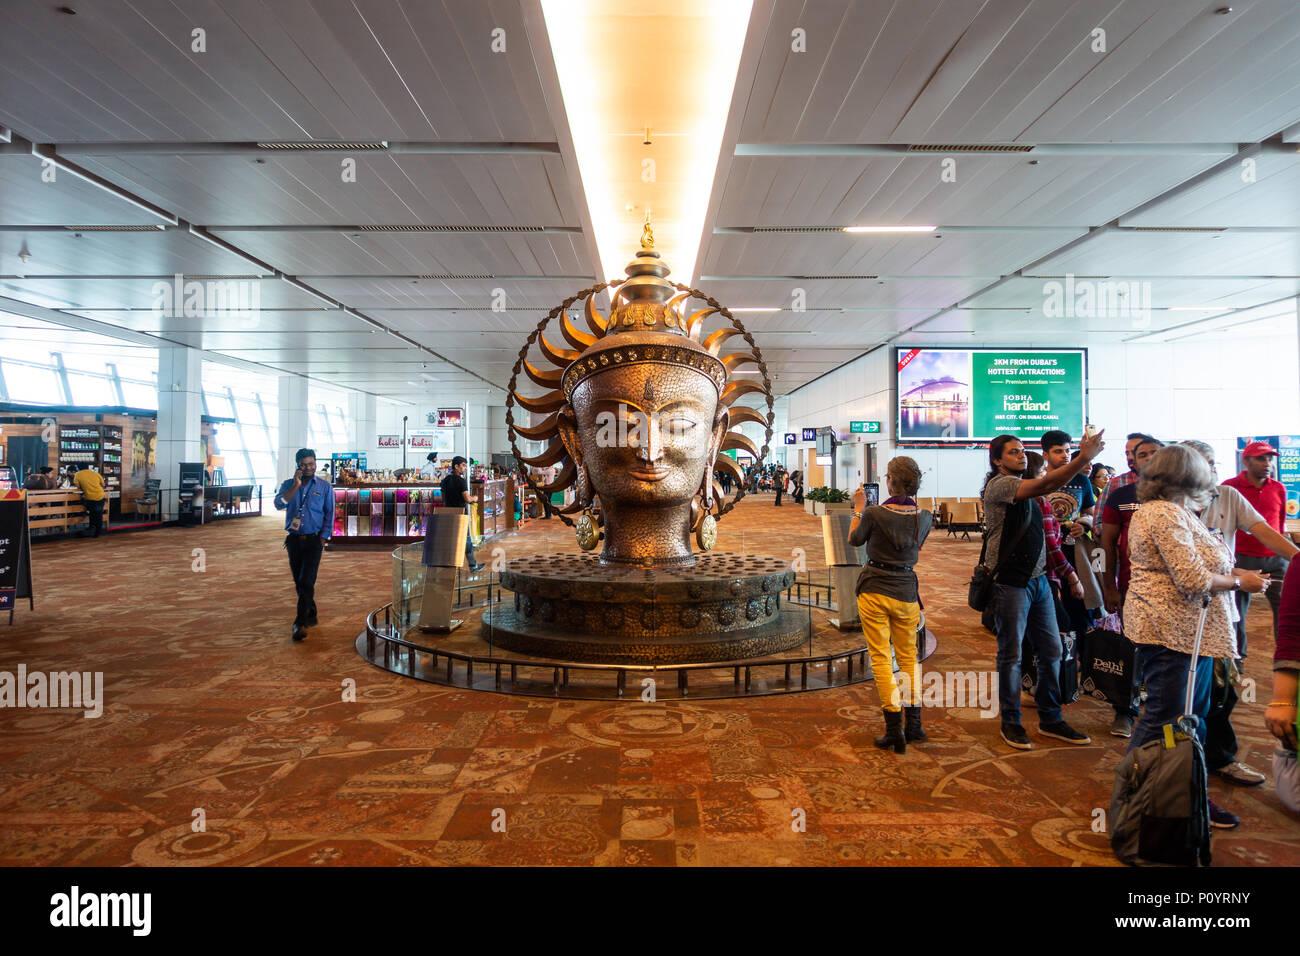 NEW DELHI, INDIA - CIRCA APRIL 2017: Surya bronze statue at Indira Gandhi International Airport, Terminal 3. Surya is the solar deity in Hinduism. - Stock Image